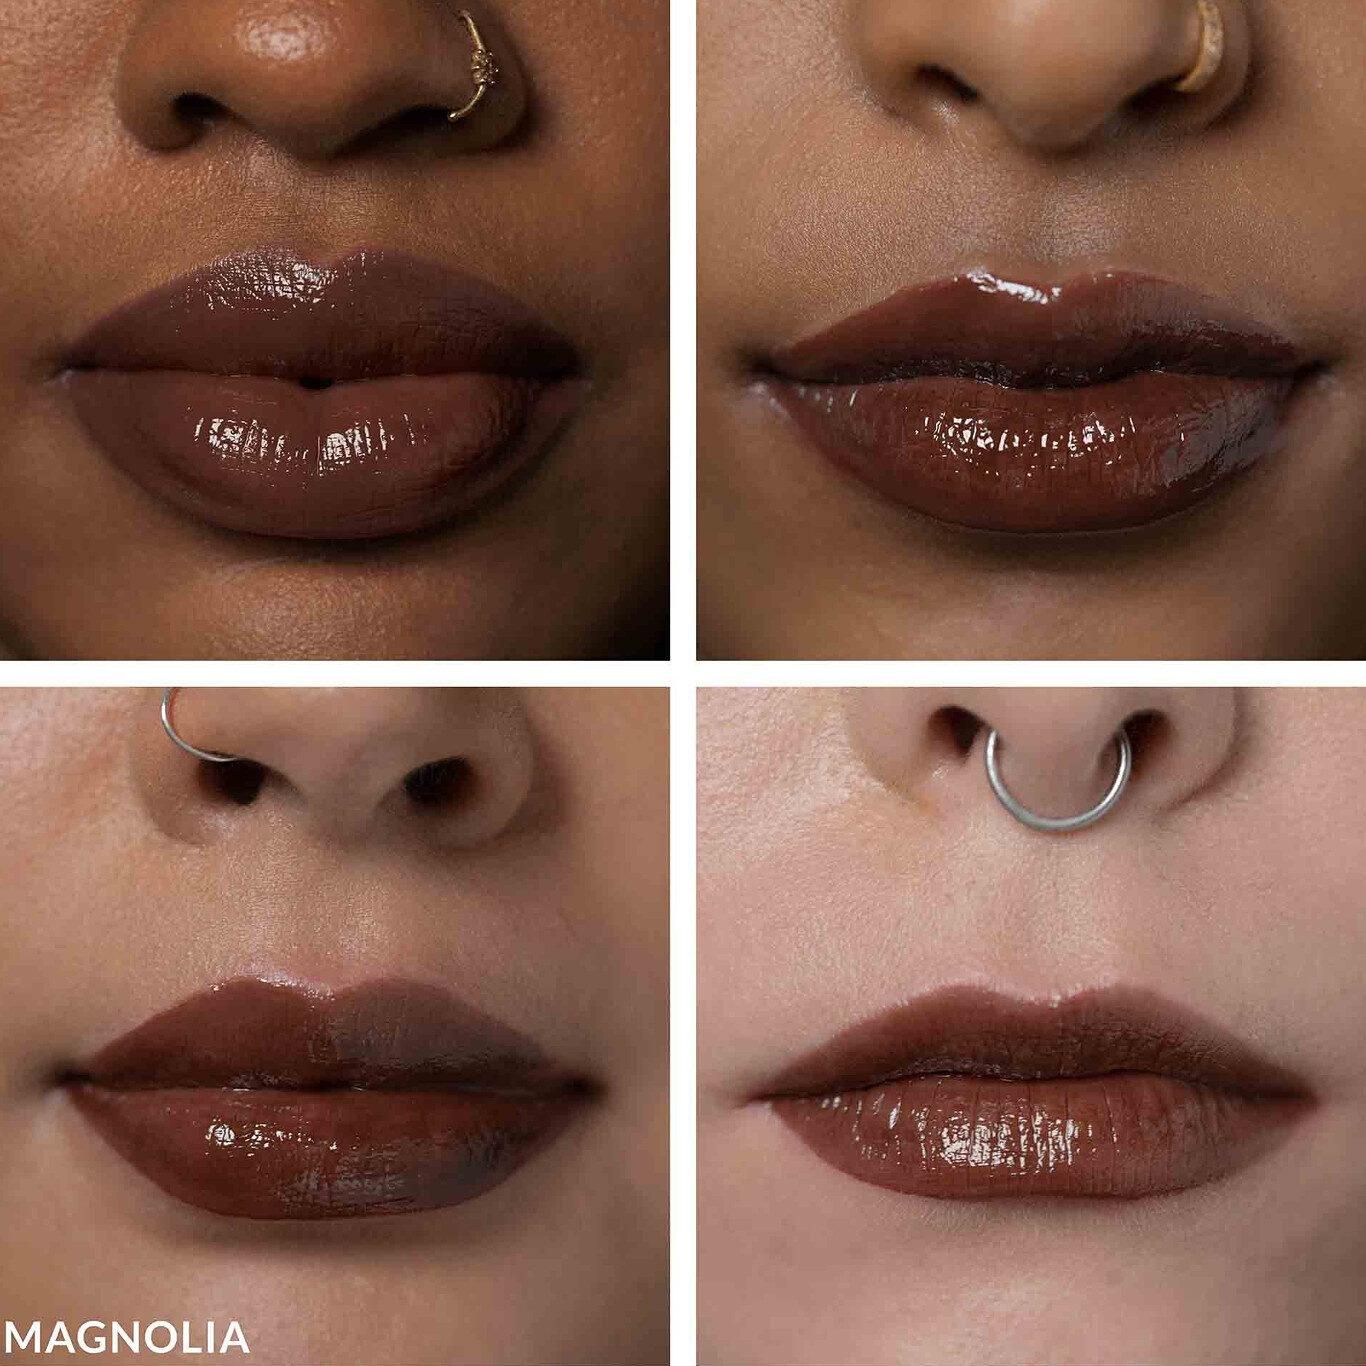 KVD Vegan Beauty XO Lip Gloss In Magnolia